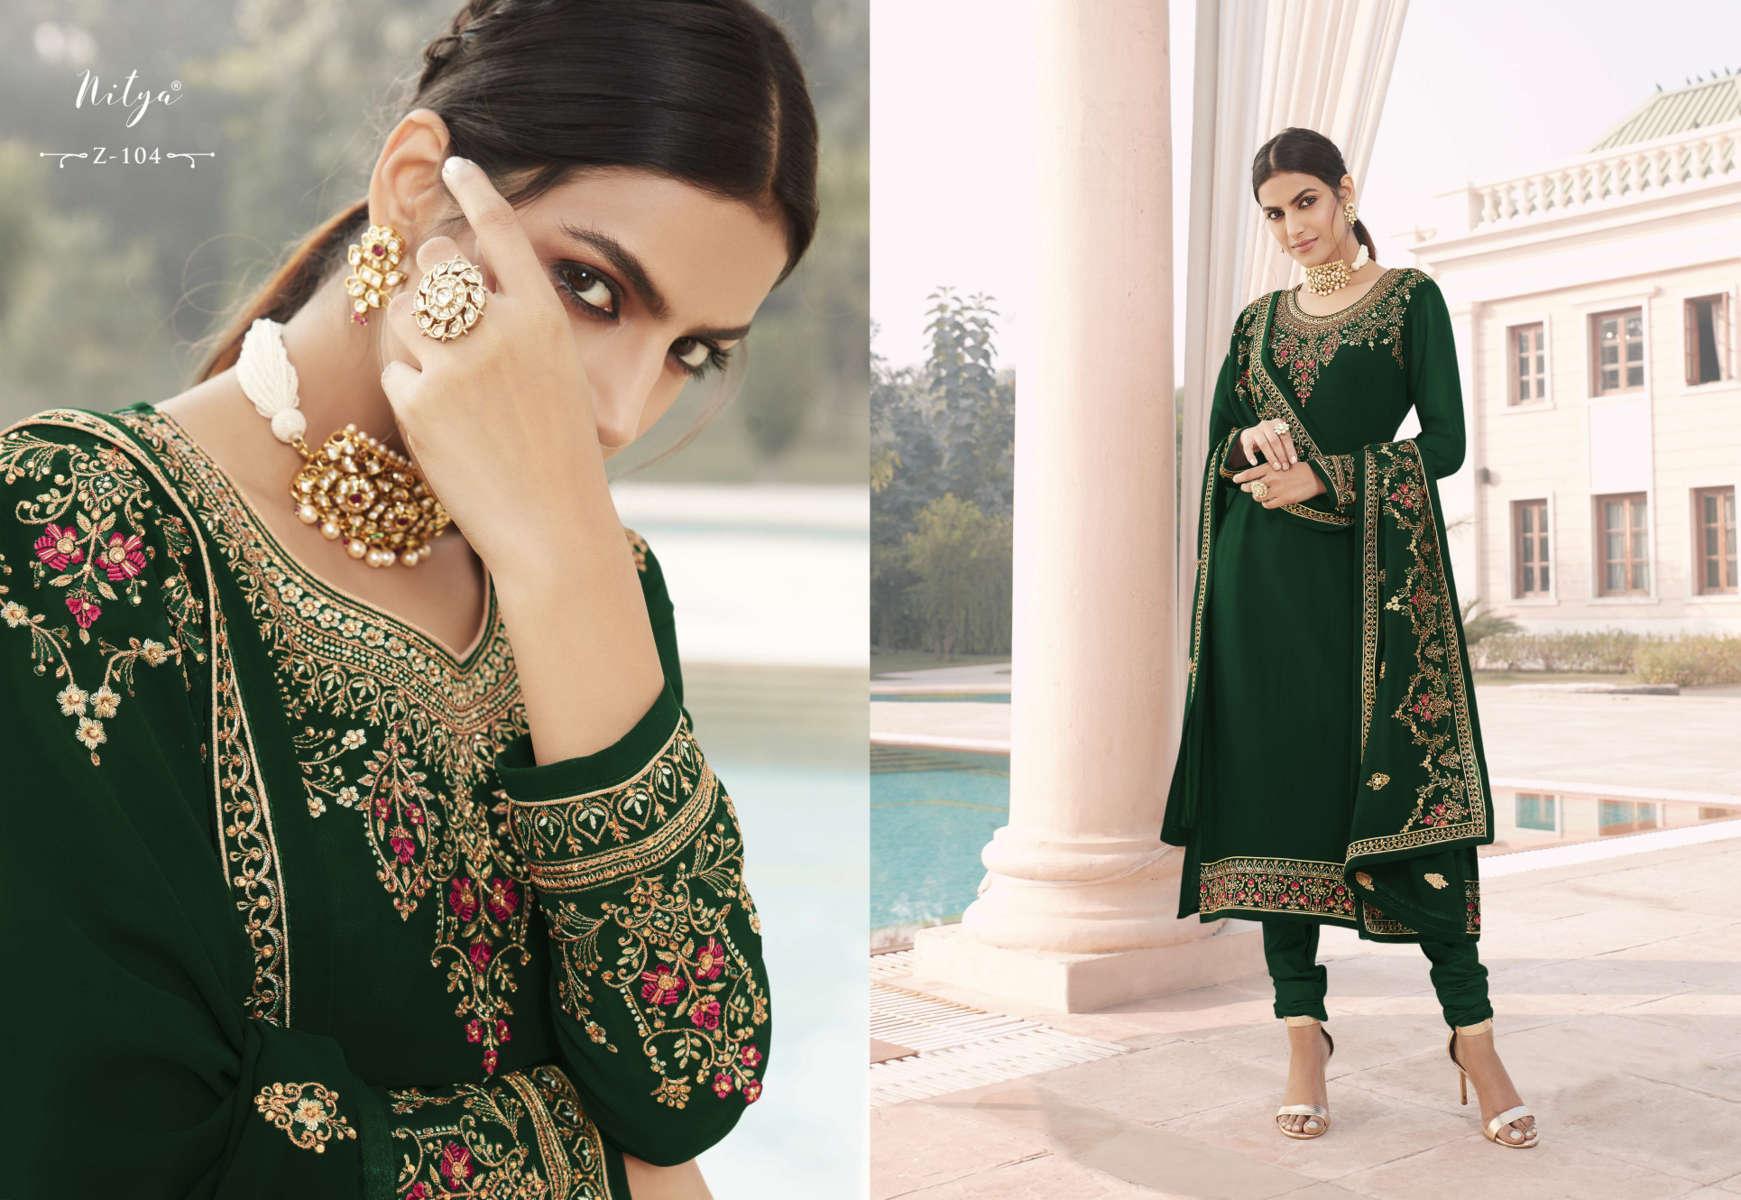 Lt Fabrics Nitya Zyrah Salwar Suit Wholesale Catalog 5 Pcs 7 1 - Lt Fabrics Nitya Zyrah Salwar Suit Wholesale Catalog 5 Pcs